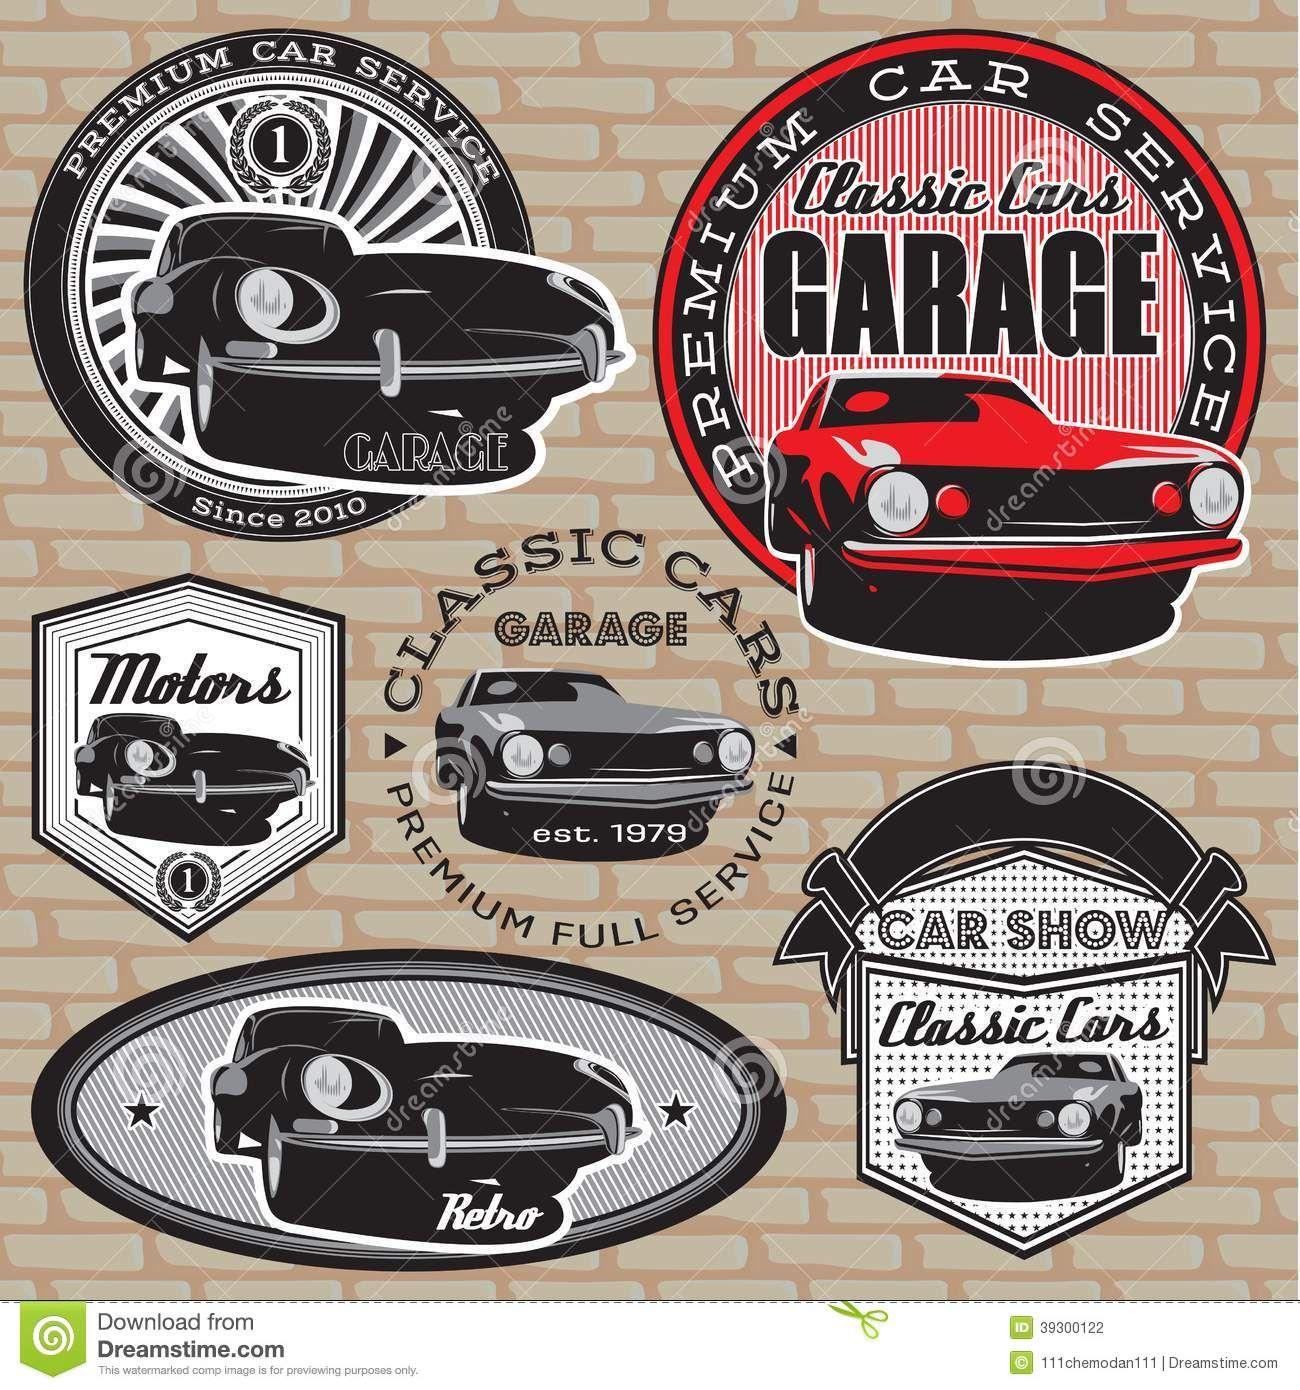 vintage retro car logo - Google Search | putfoot | Pinterest | Car ...